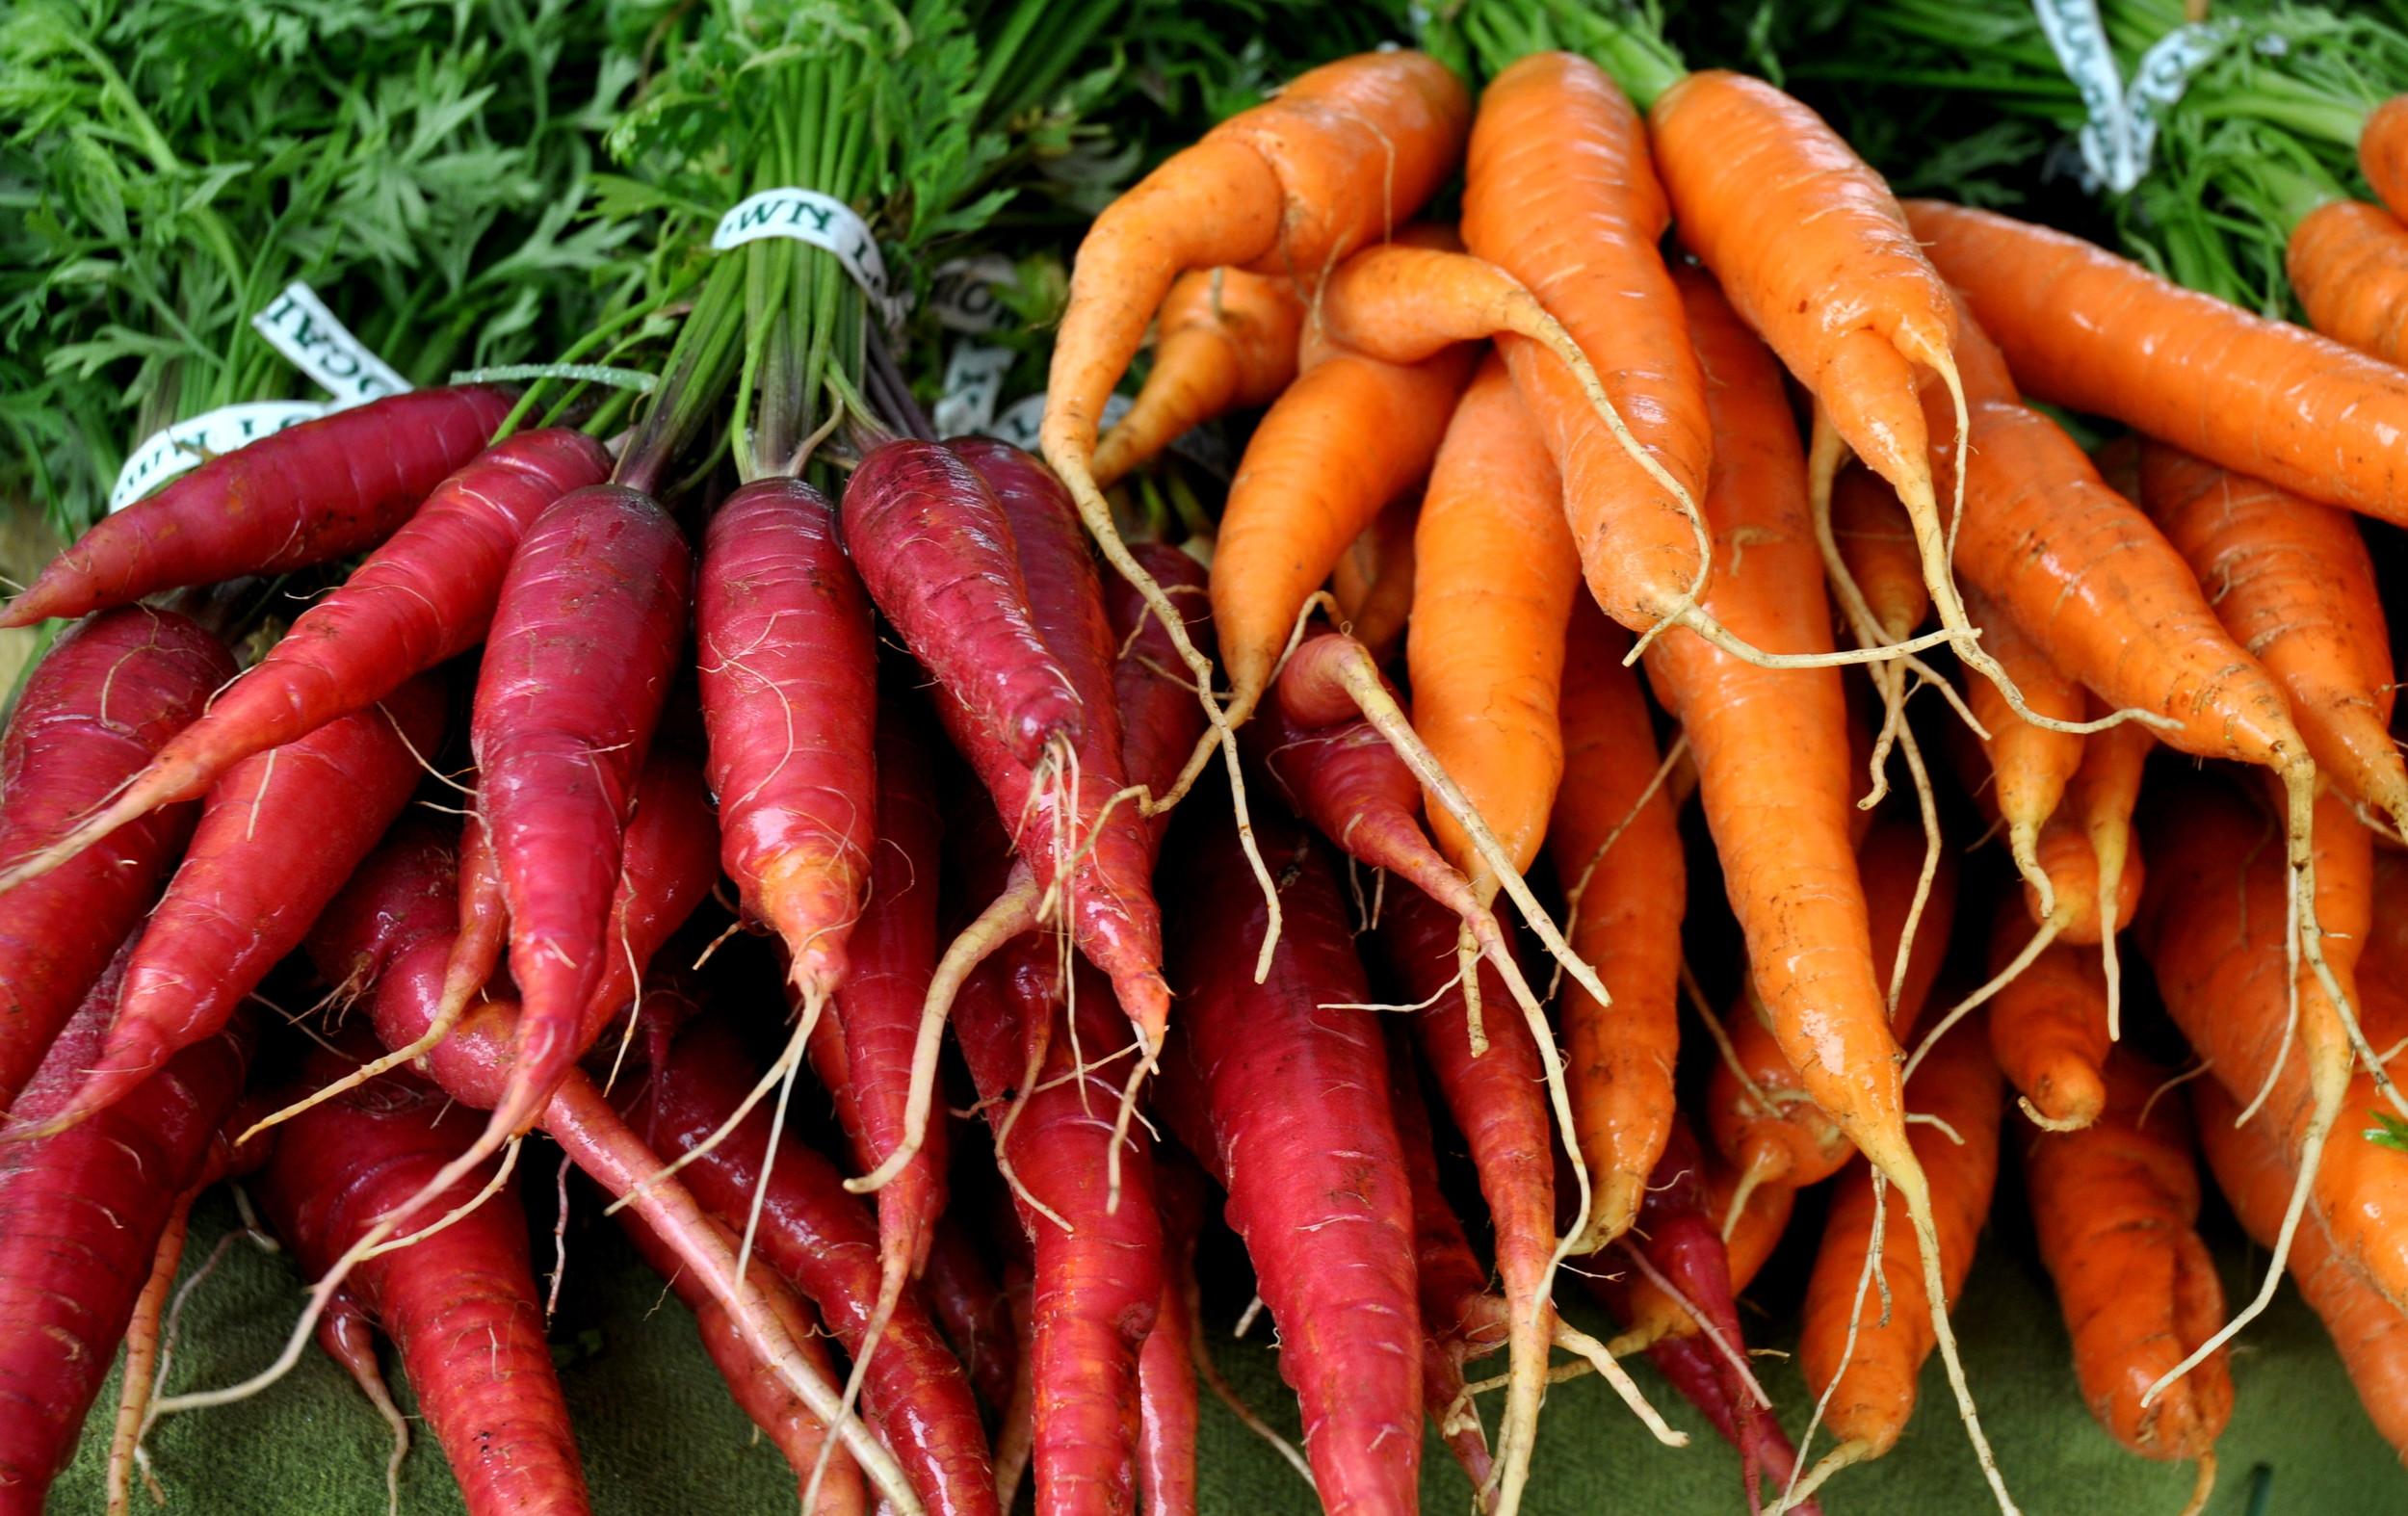 Carrots from City Grown Farm. Photo copyright 2013 by Zachary D. Lyons.